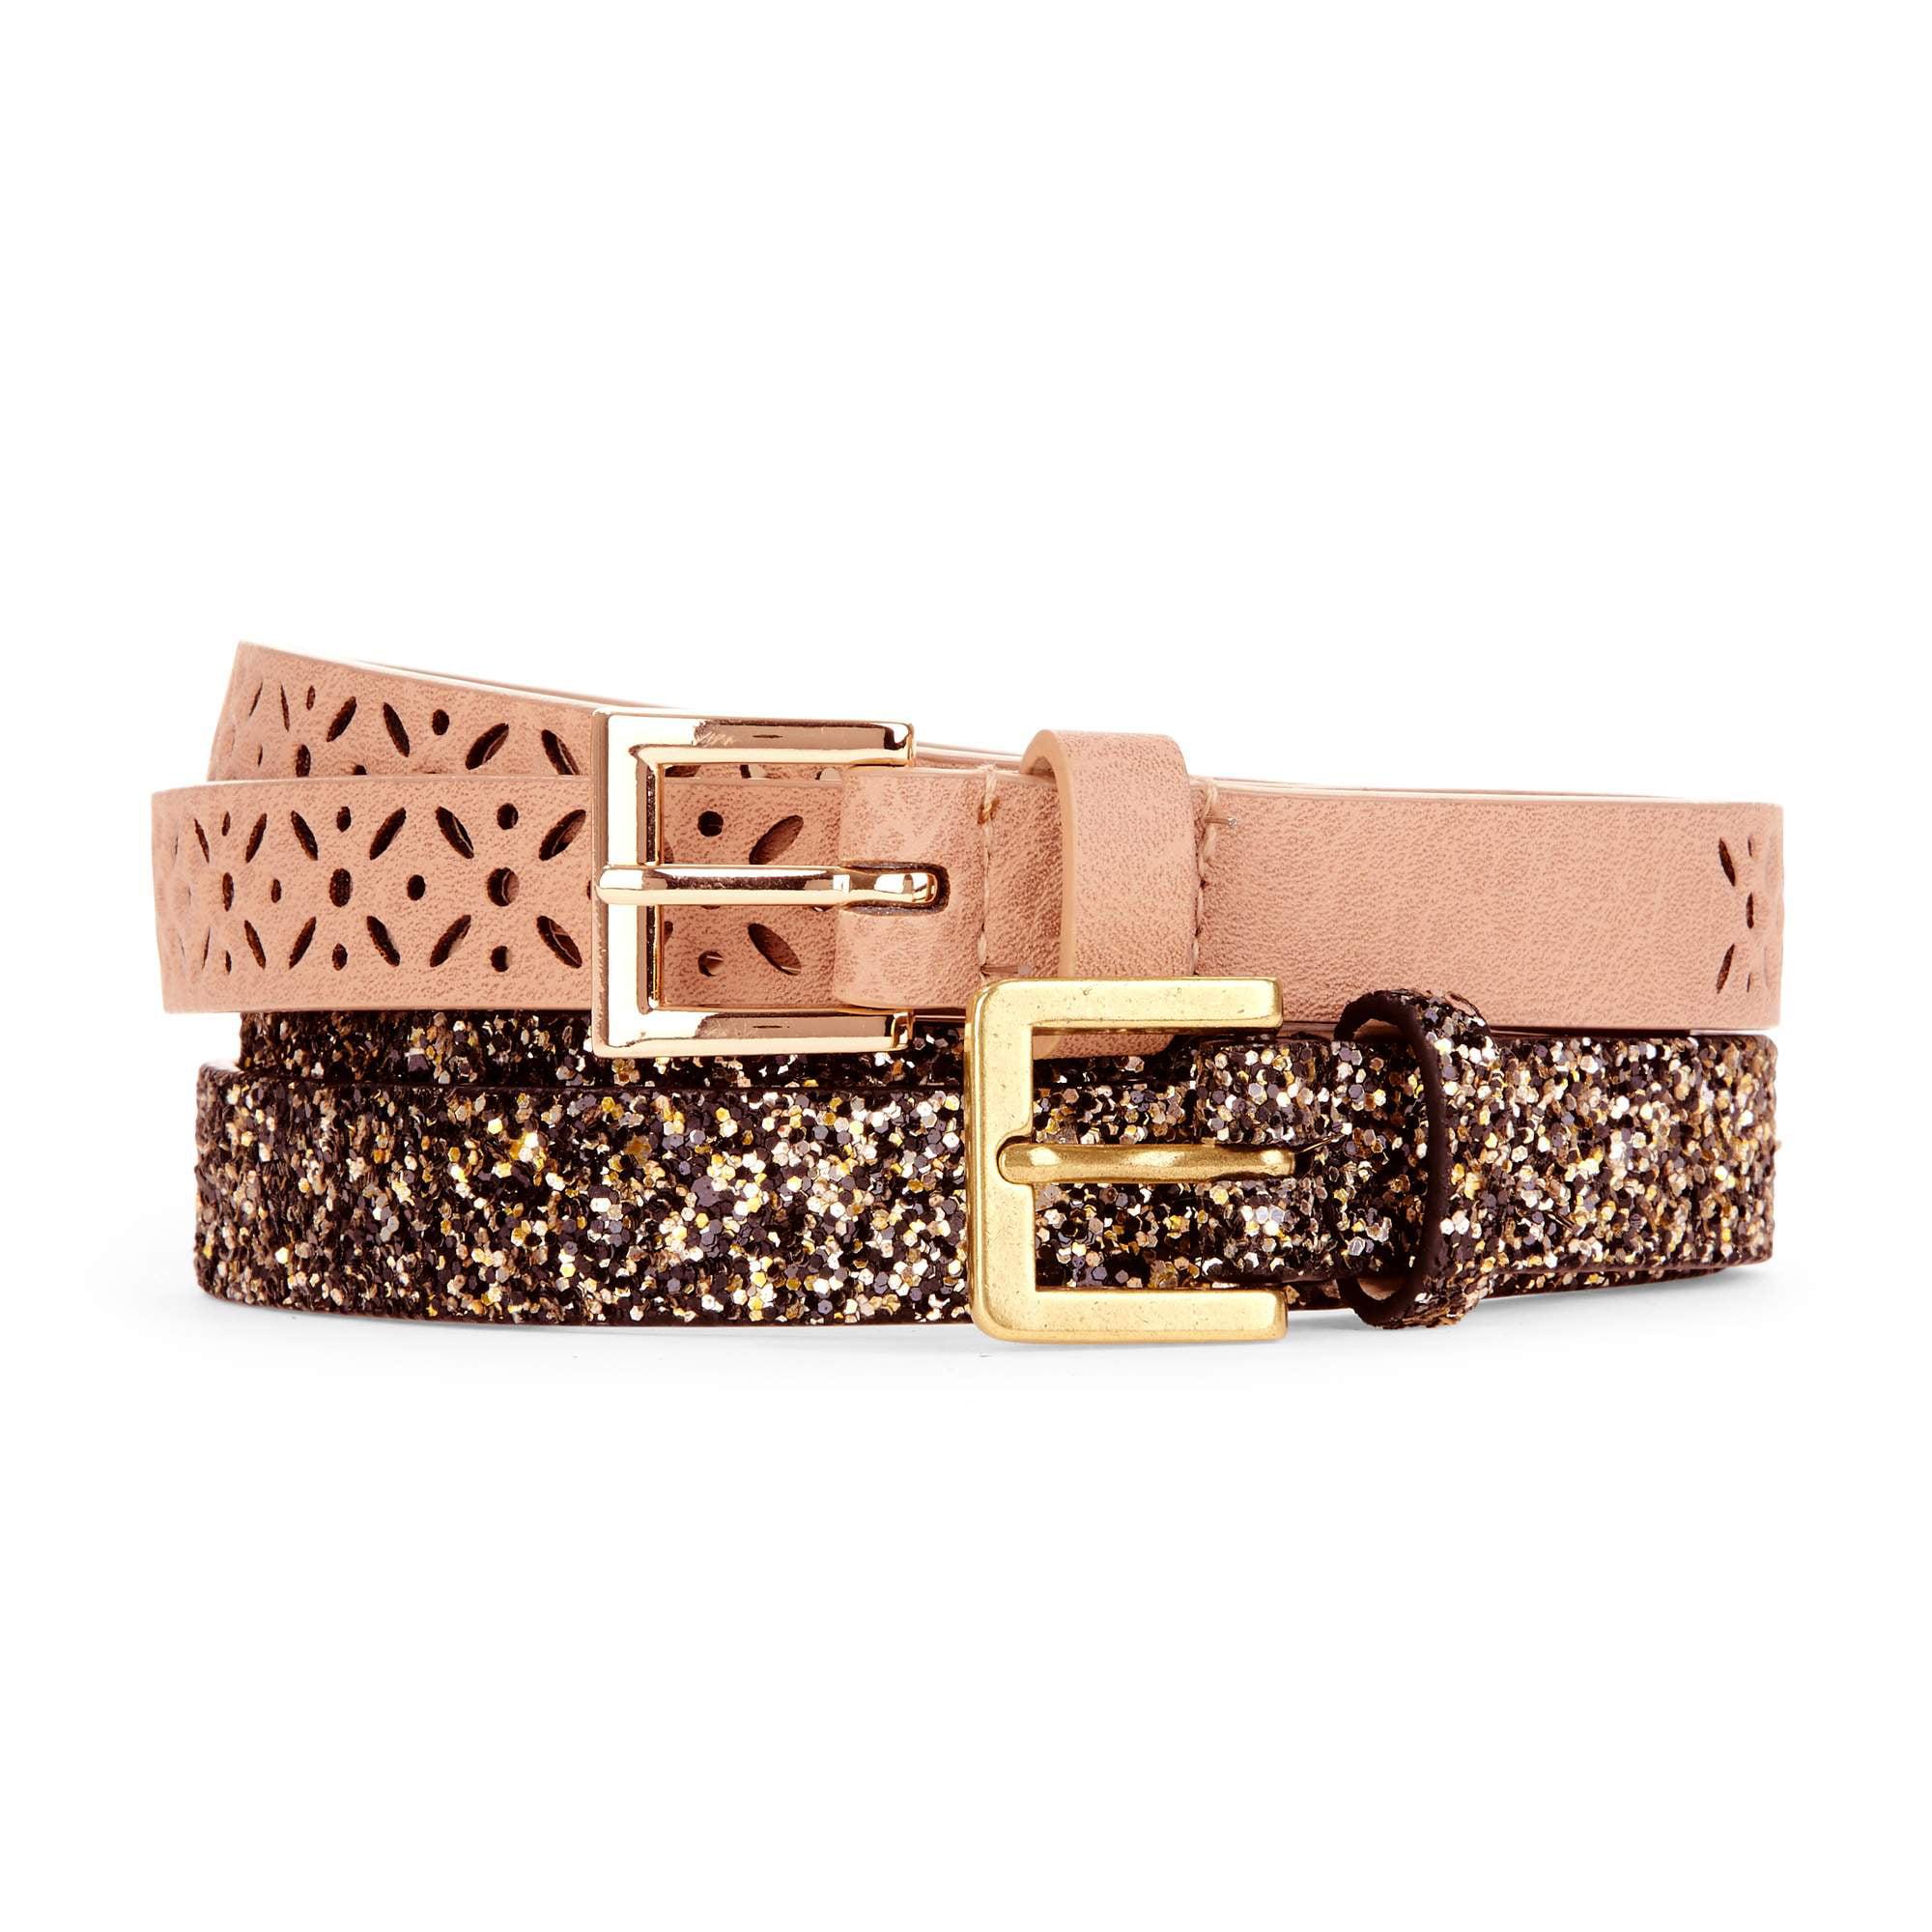 No Boundaries Women's Fashion Basic Belt, 2-Pack